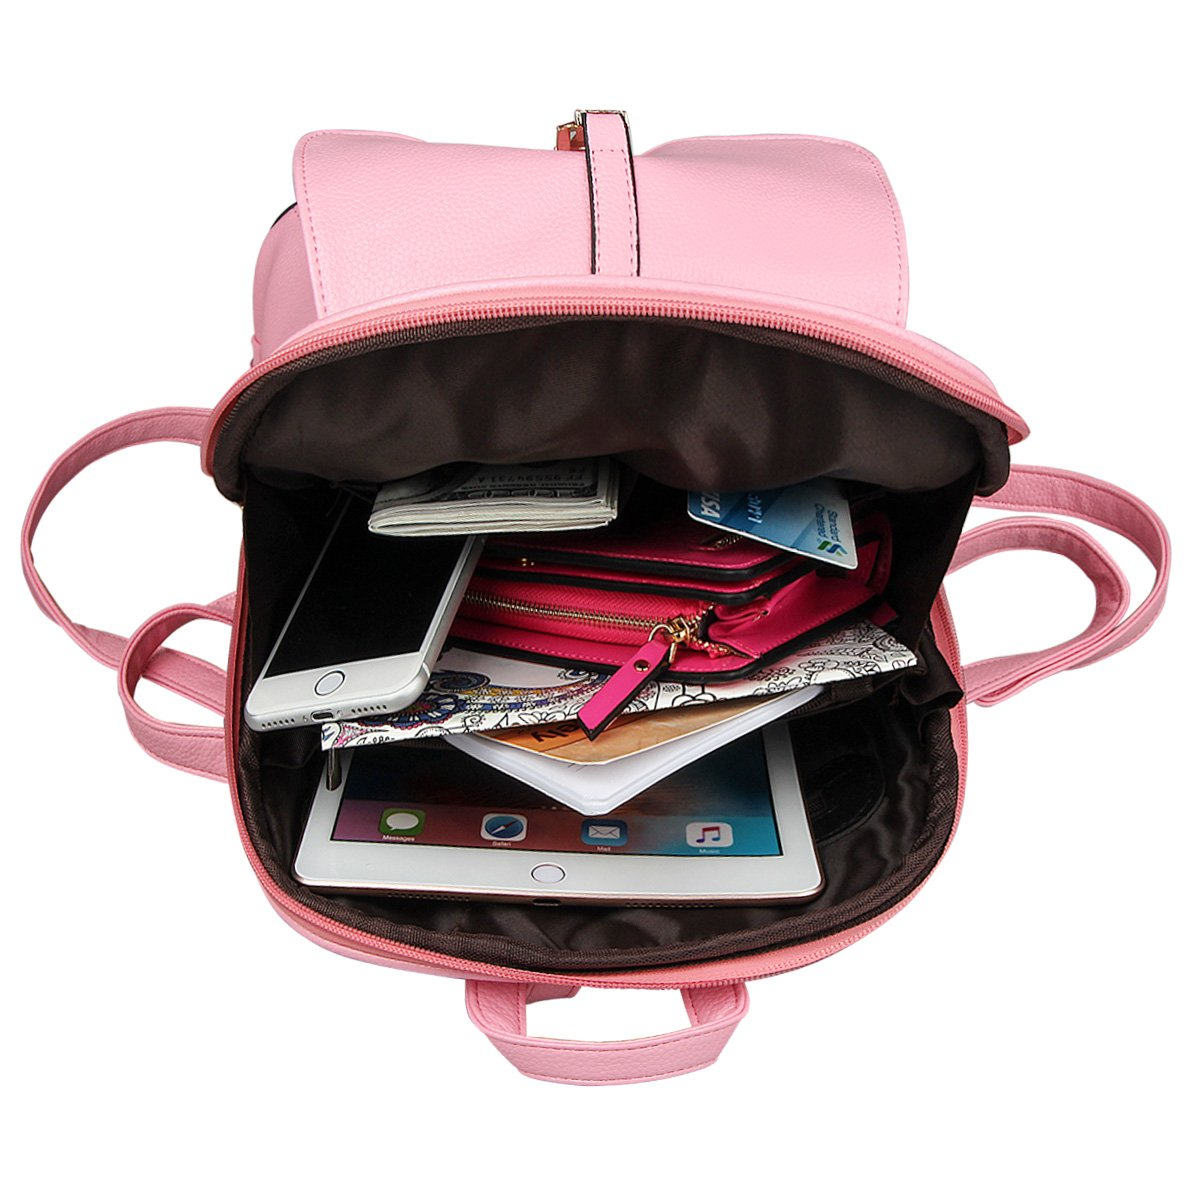 xhorizon TM FL1 Leather Mini School Bag Travel Backpack Rucksack Shoulder Bag Satchel (Navy) by xhorizon (Image #6)